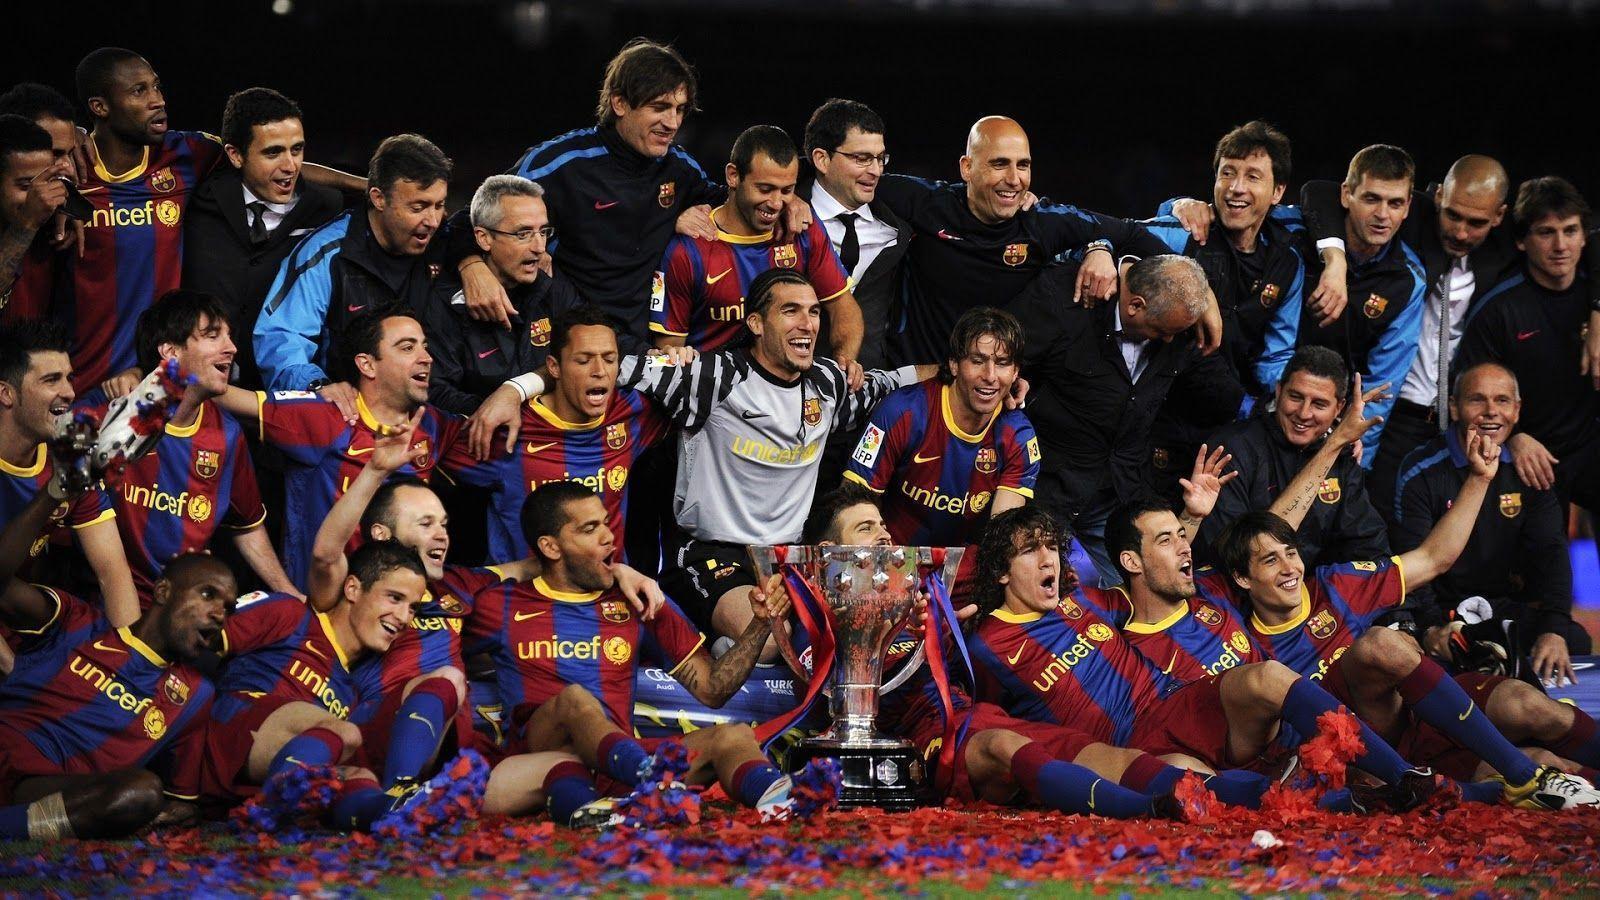 FC Barcelona National Football Team Background 10